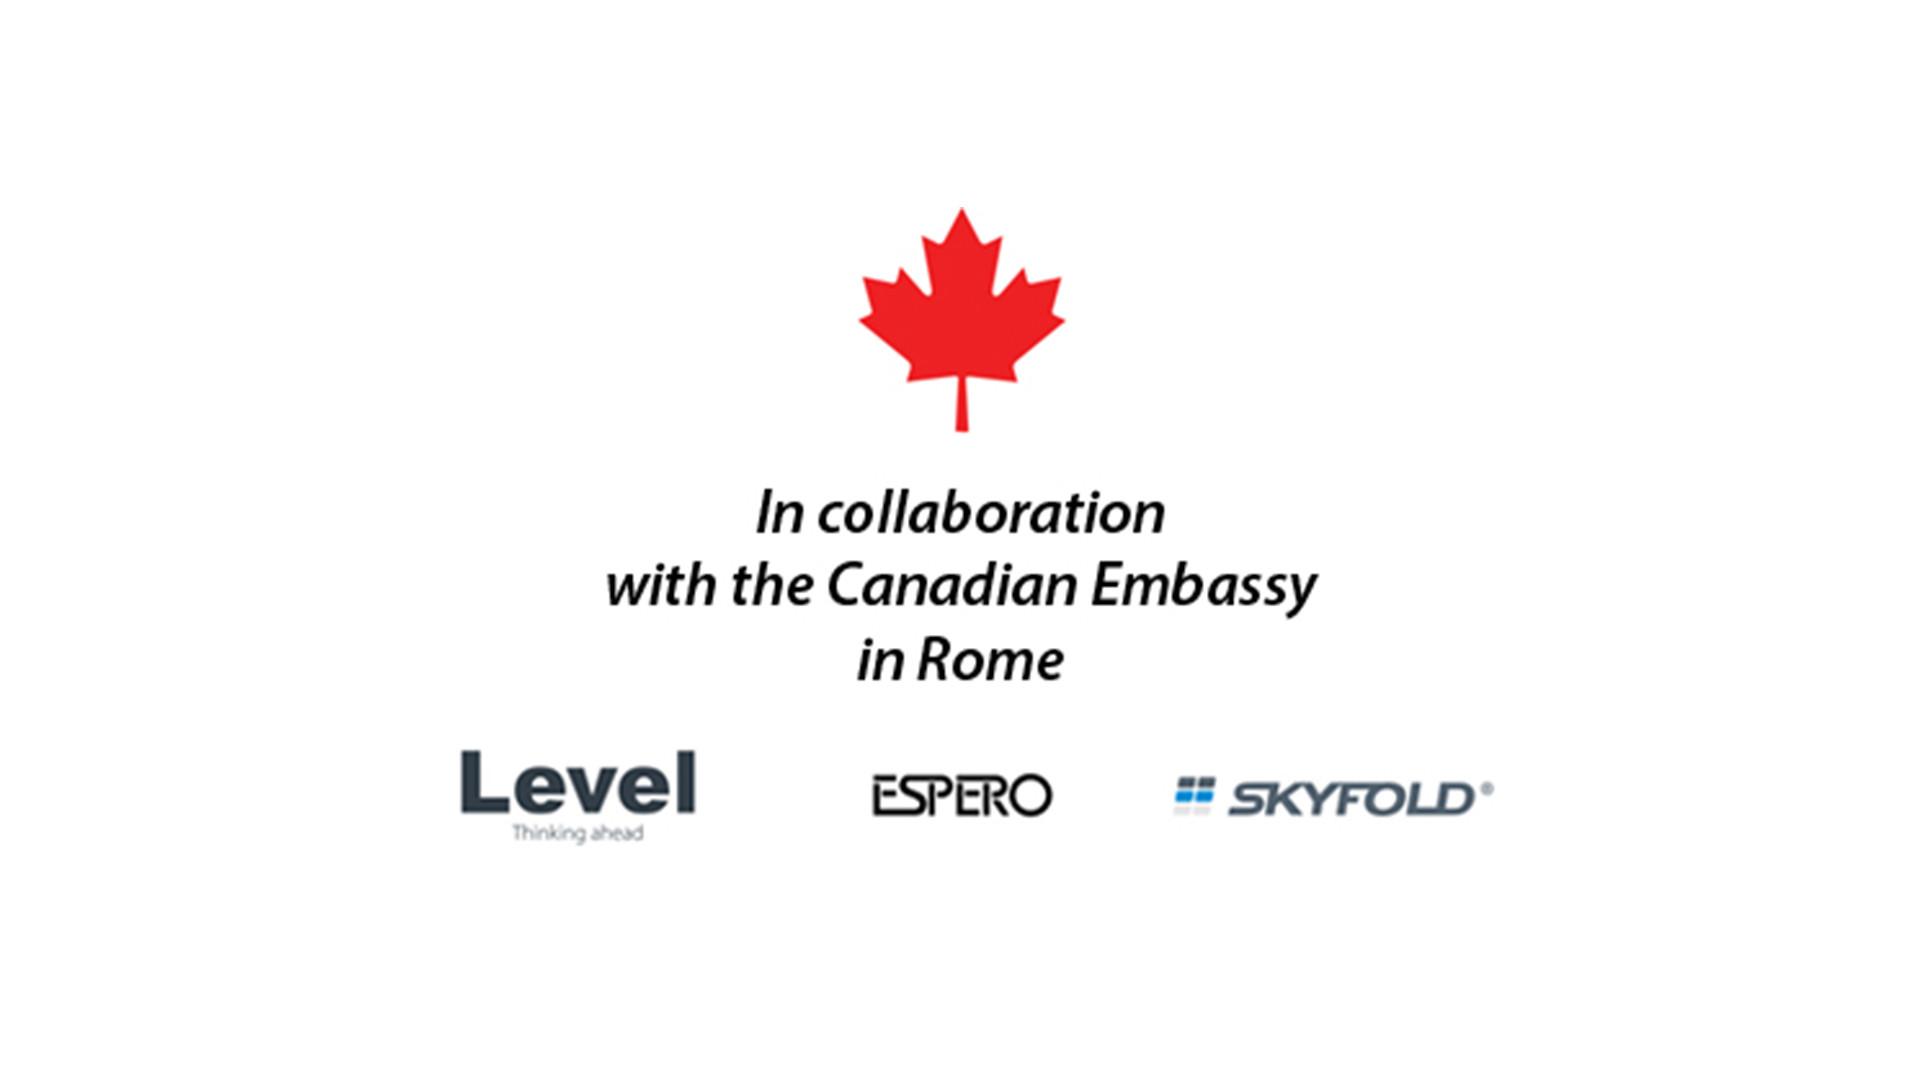 Skyfold_Level Office Landscape_Canadian Embassy